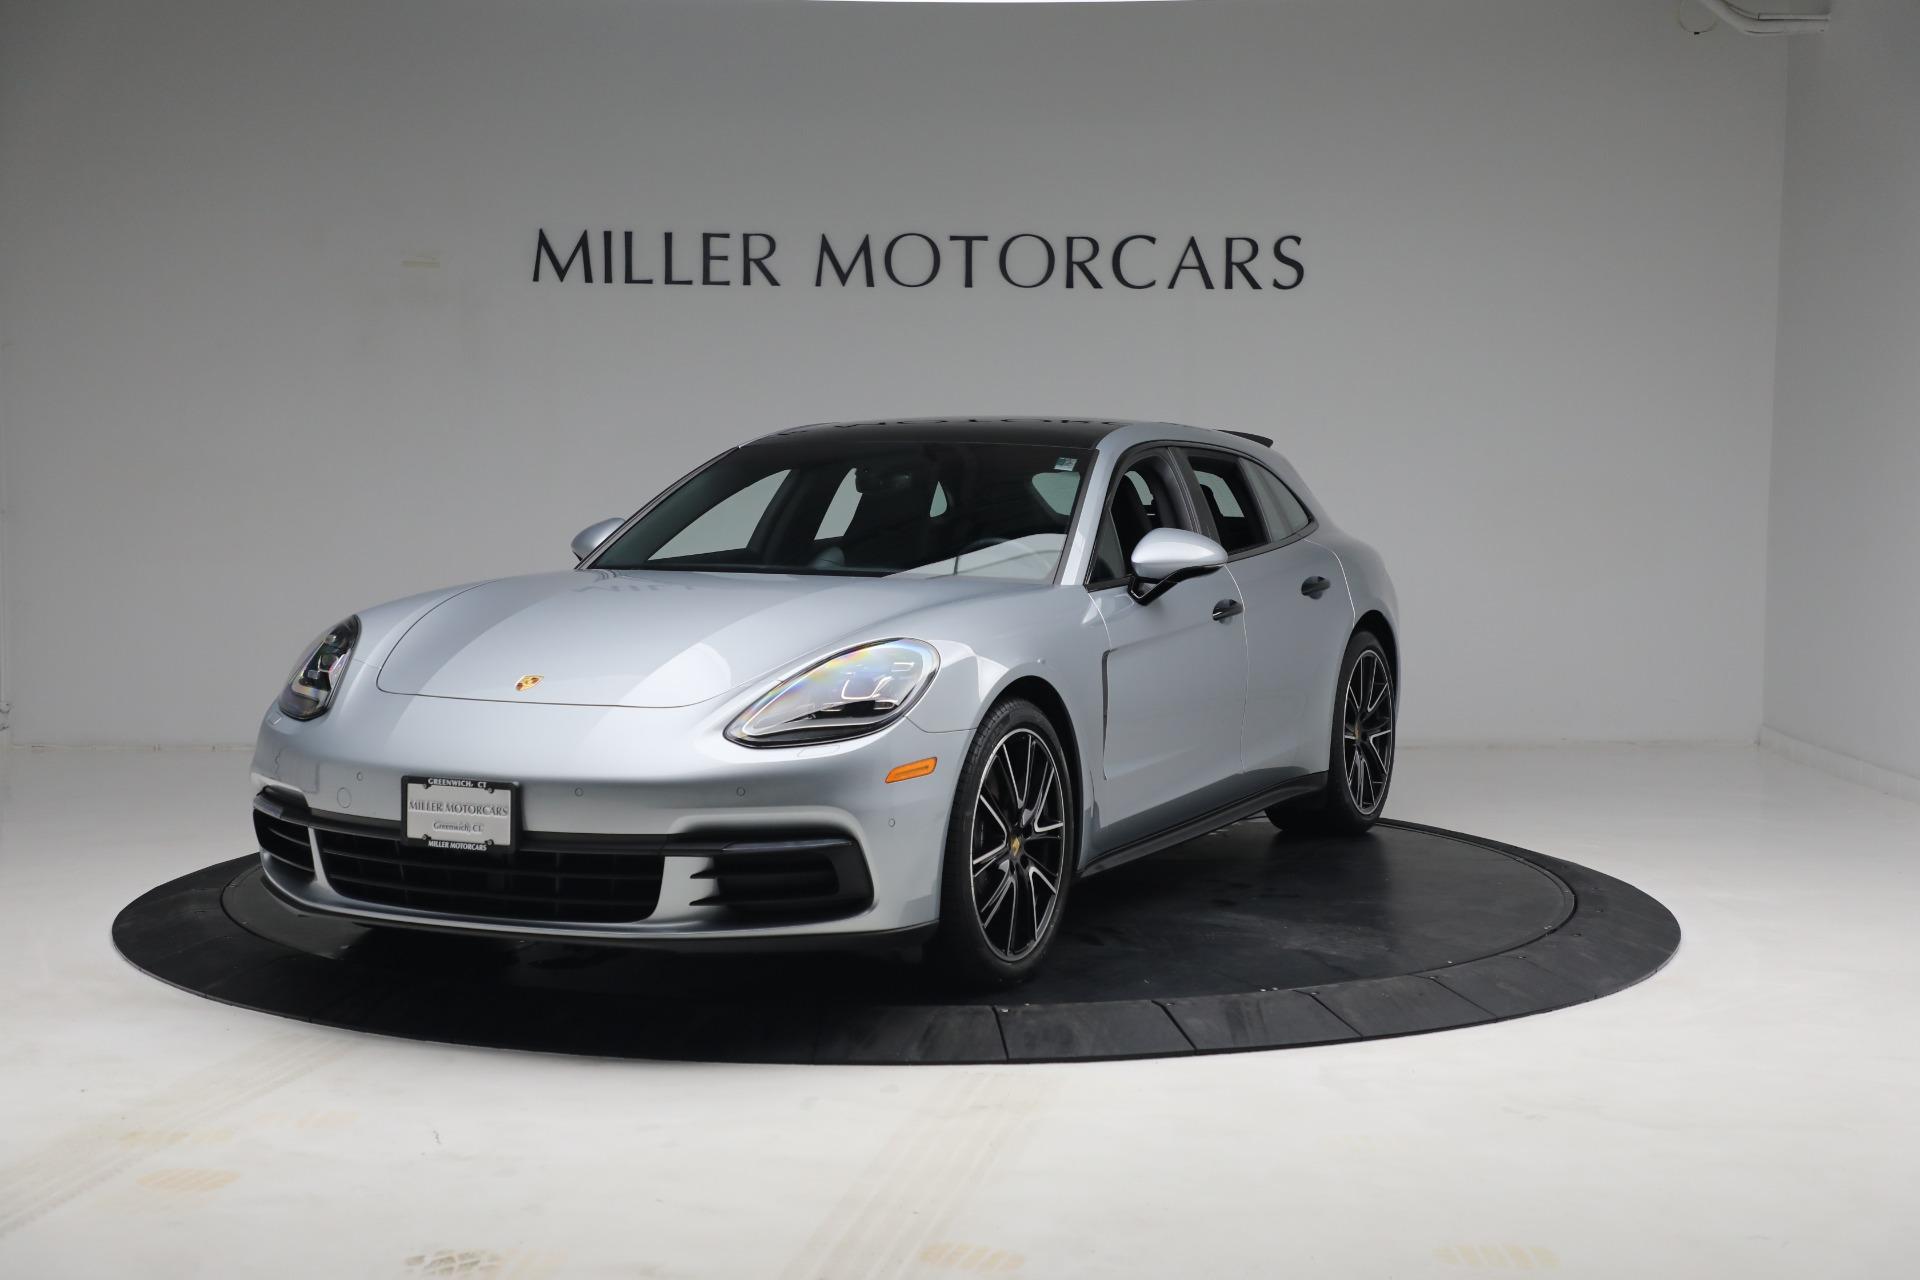 Used 2018 Porsche Panamera 4 Sport Turismo for sale $97,900 at Alfa Romeo of Westport in Westport CT 06880 1